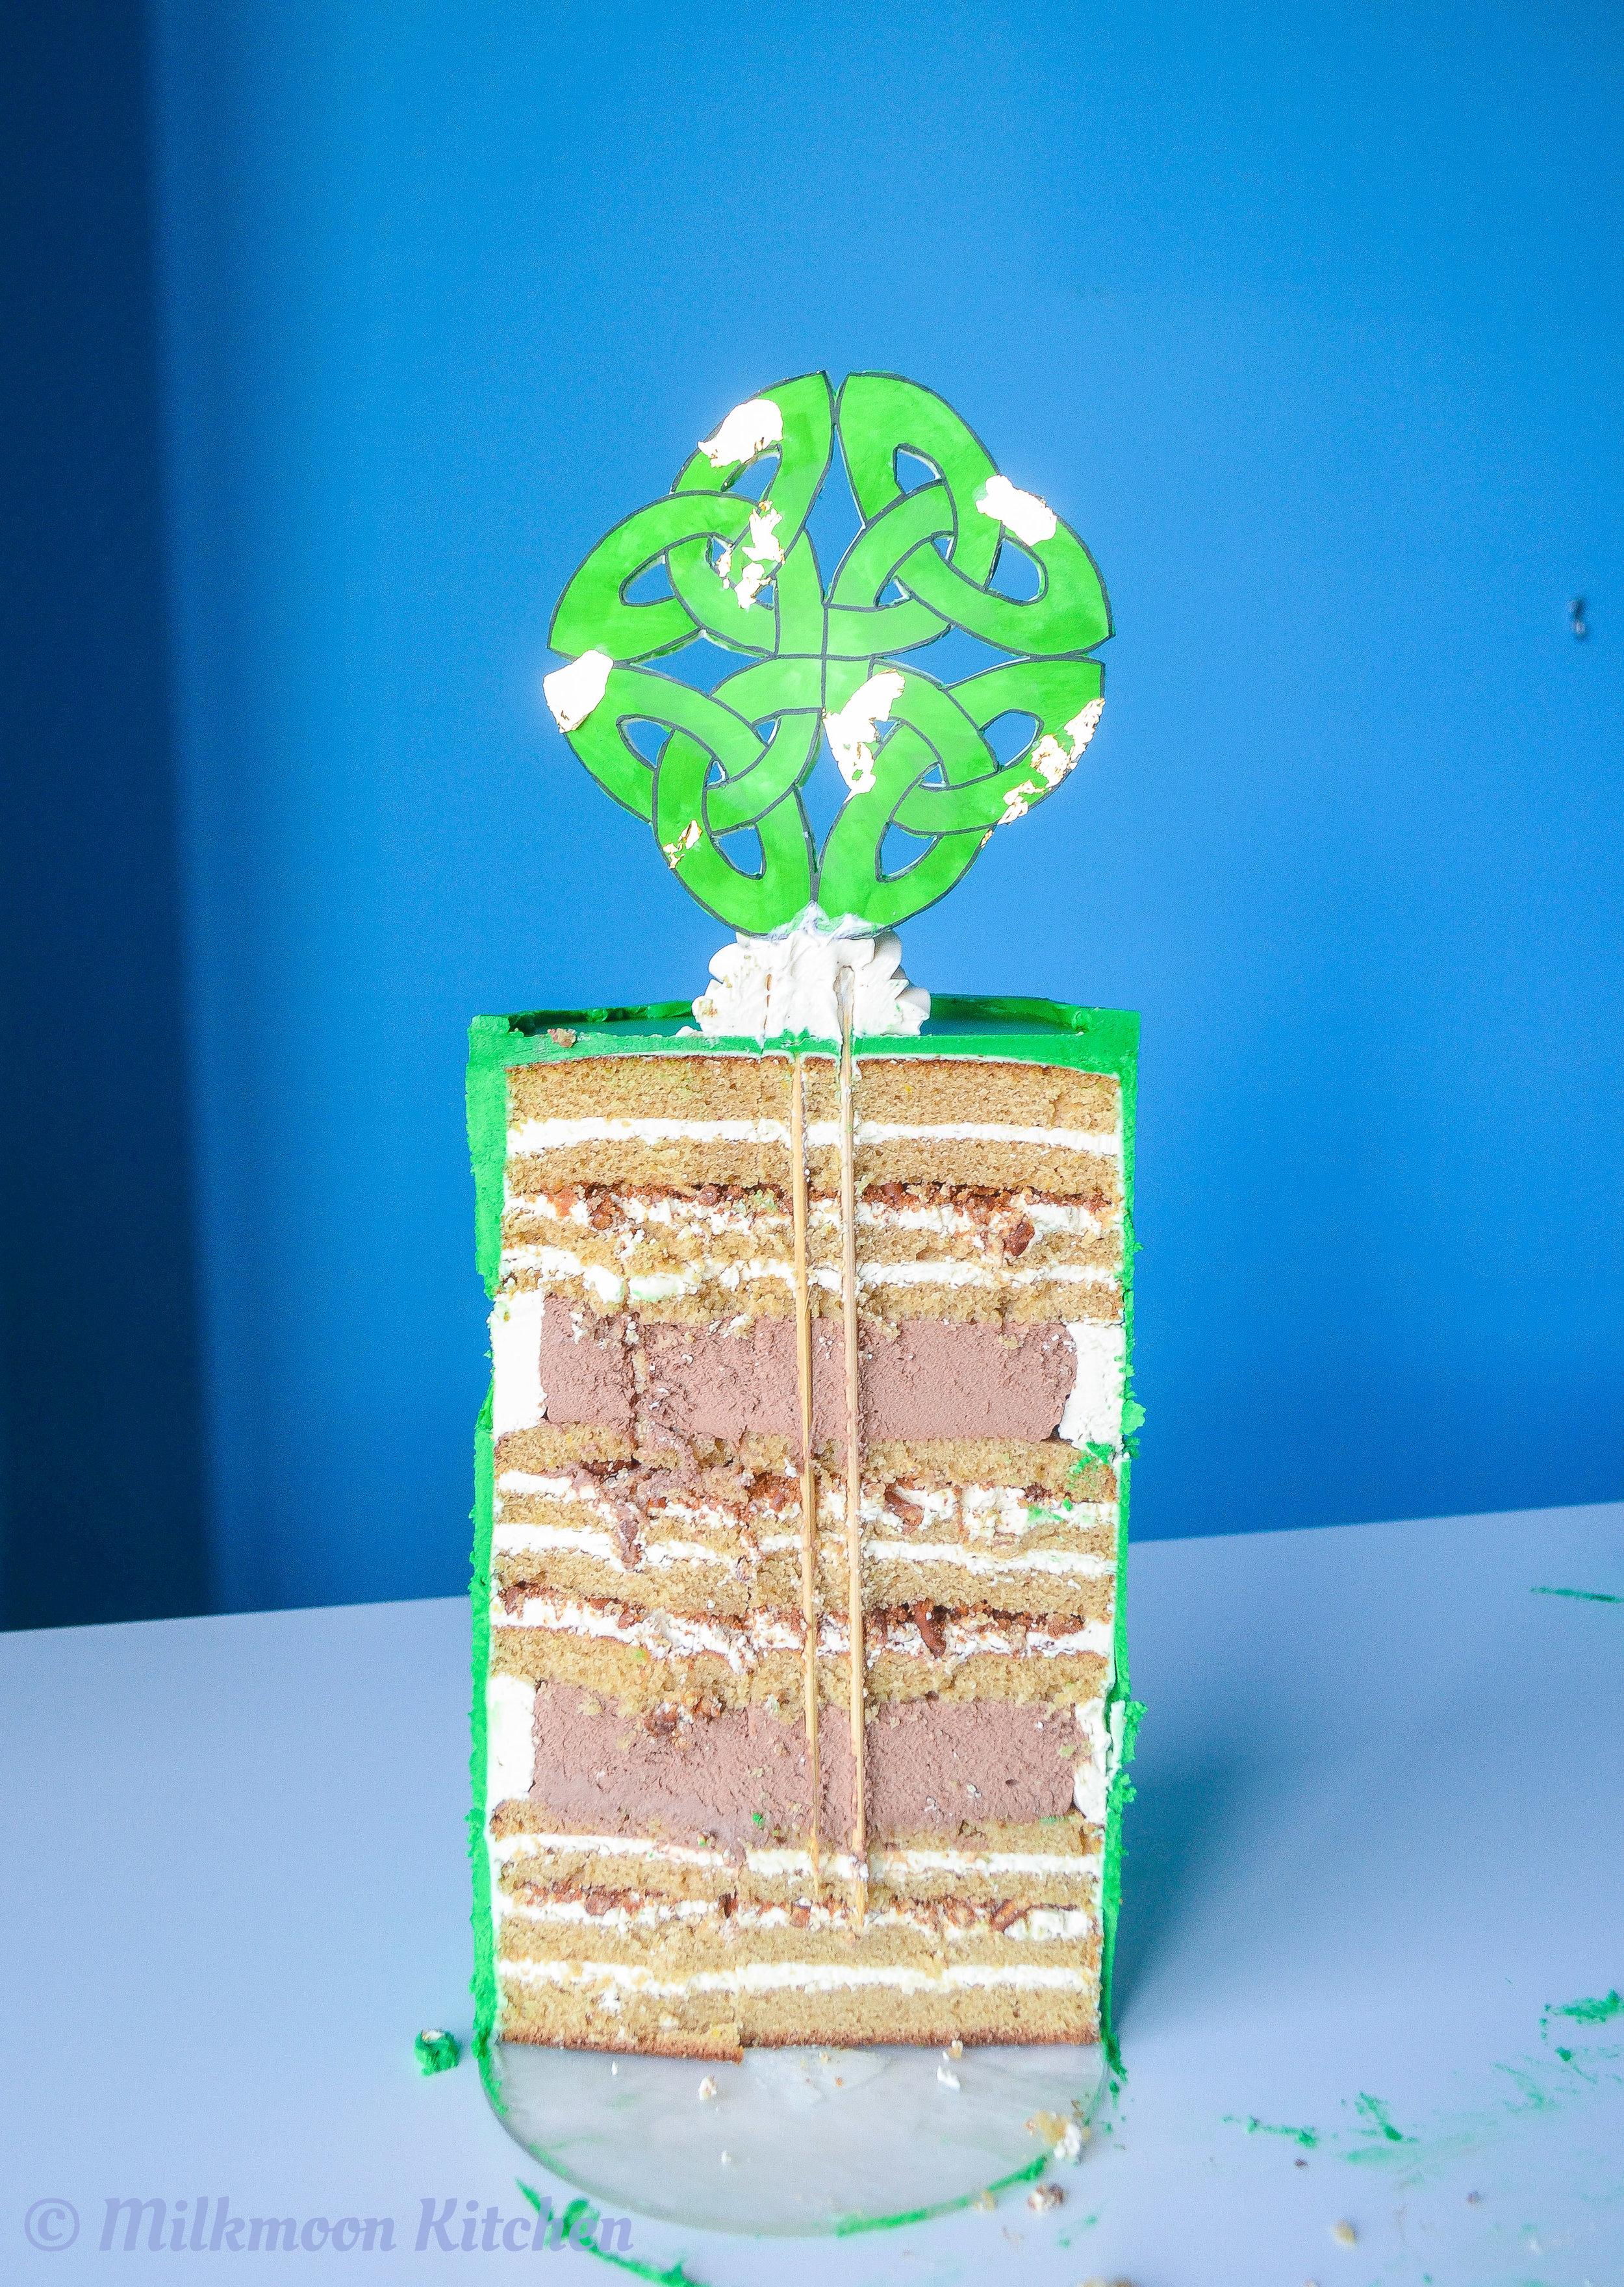 Celtic Knot Cake by Milkmoon Kitchen